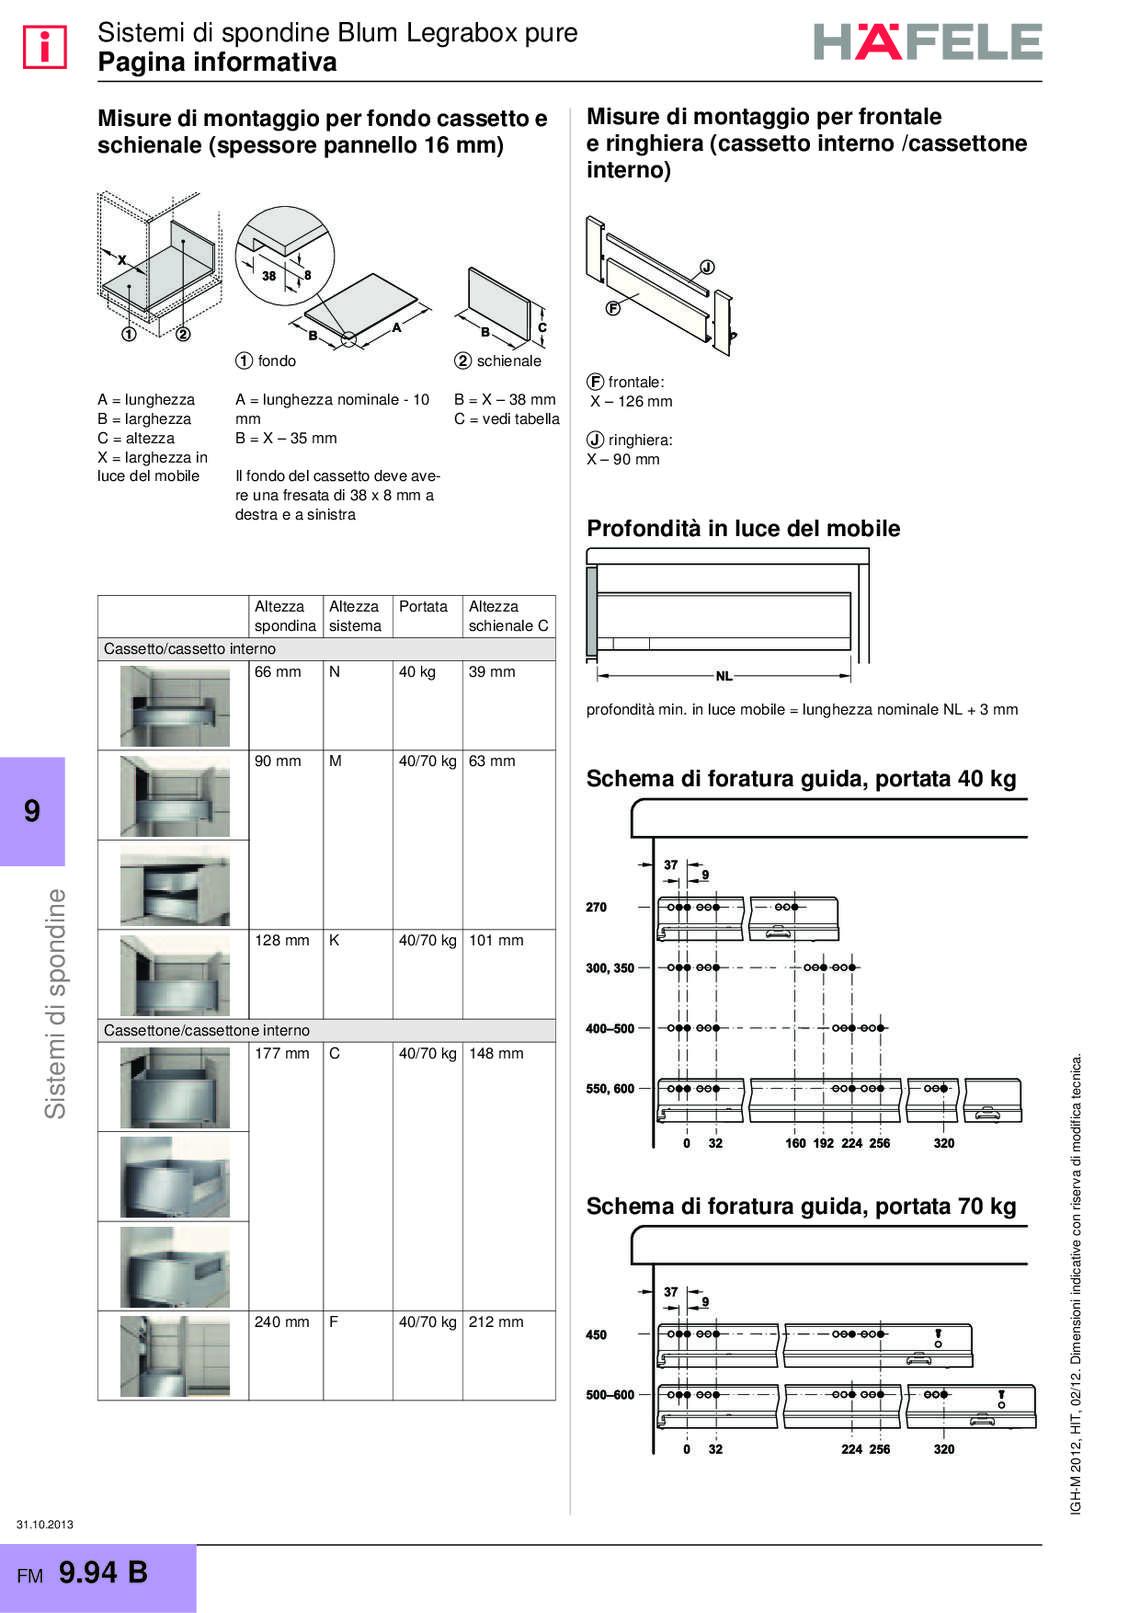 hafele-spondine-e-guide-per-mobili_40_119.jpg